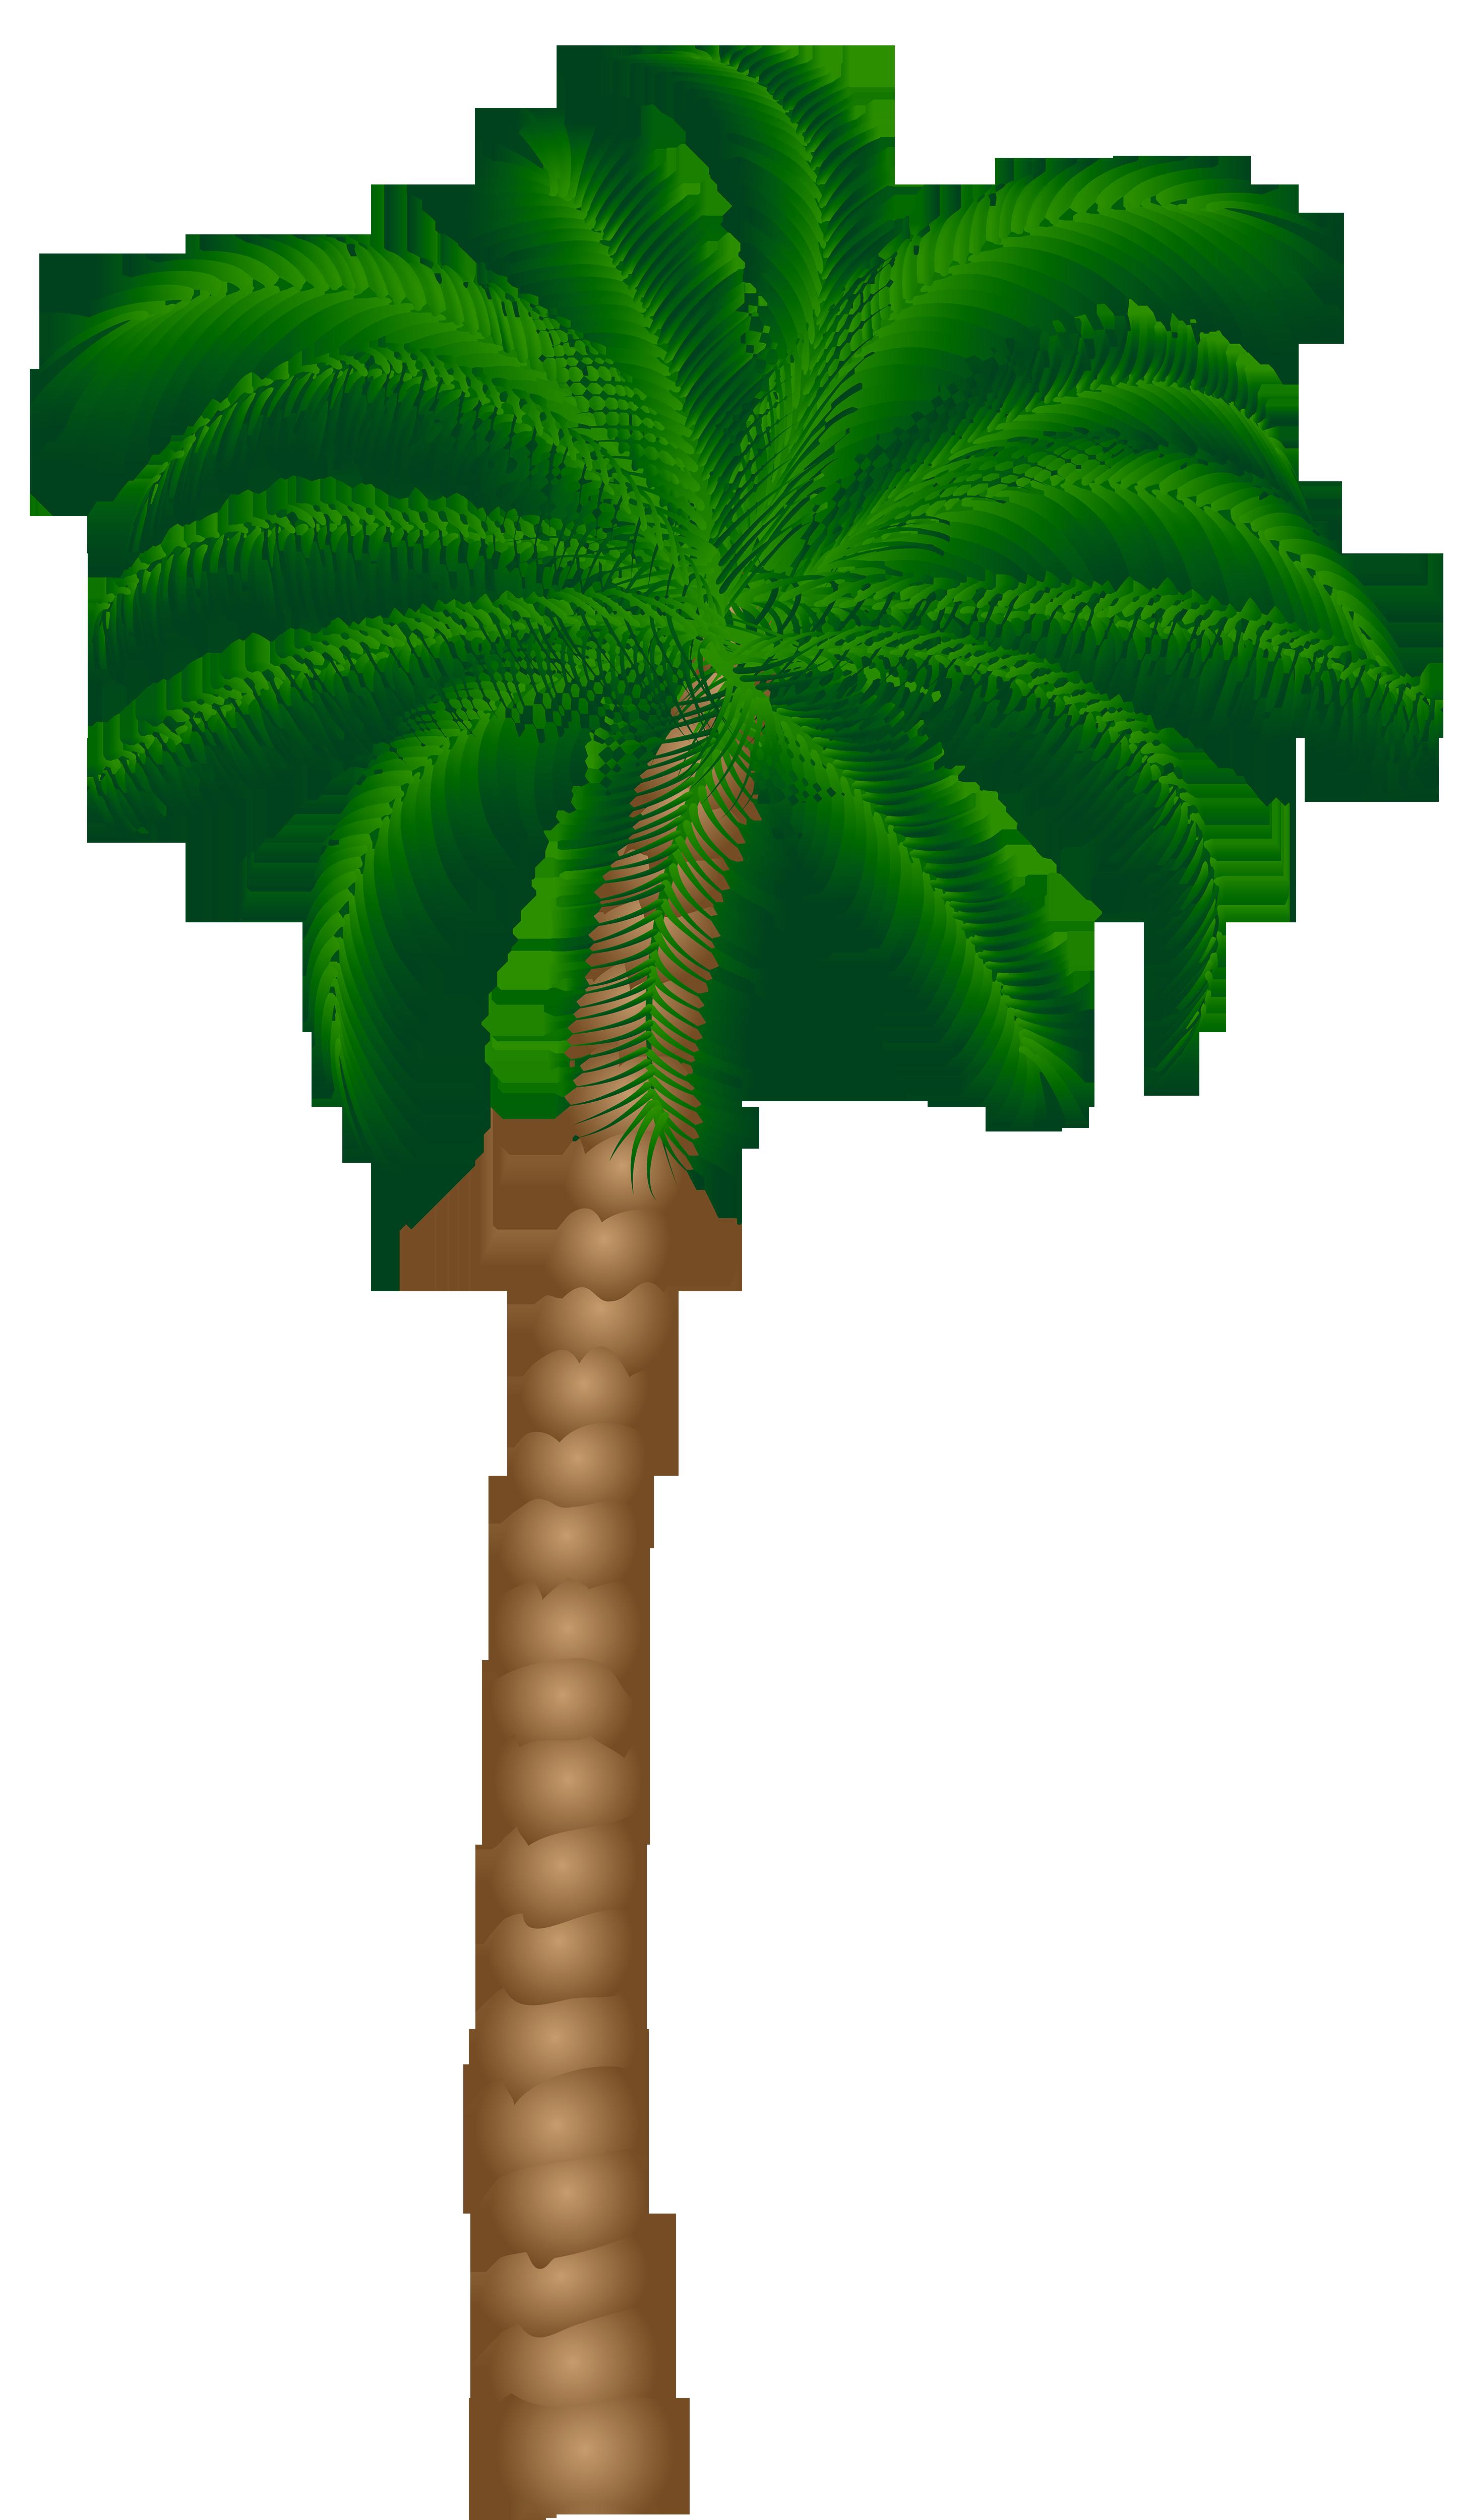 Desert clipart palm tree desert. Png gallery yopriceville high